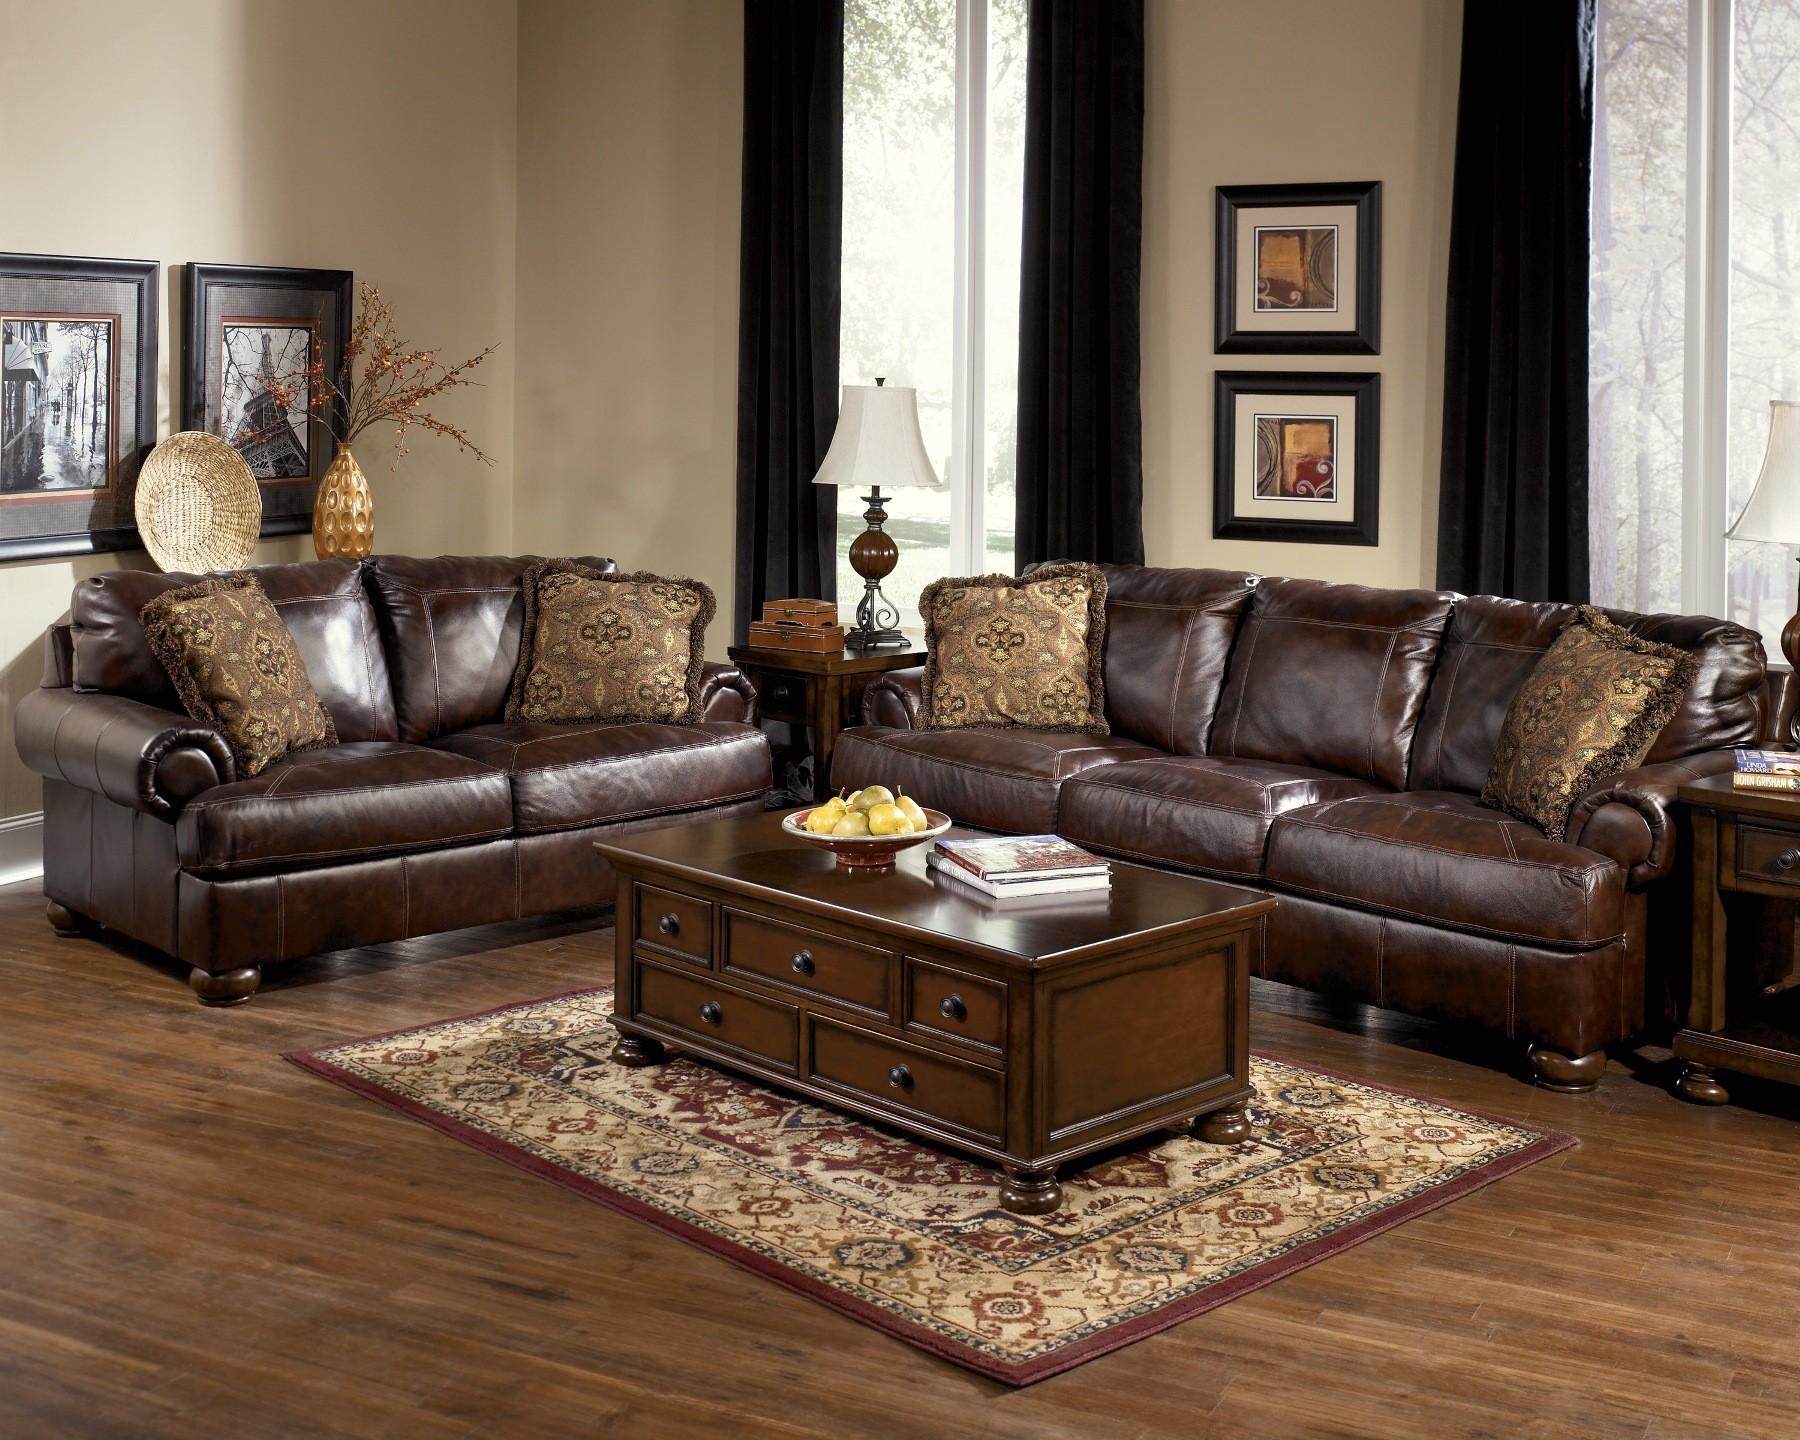 Axiom walnut living room set from ashley 42000 coleman furniture